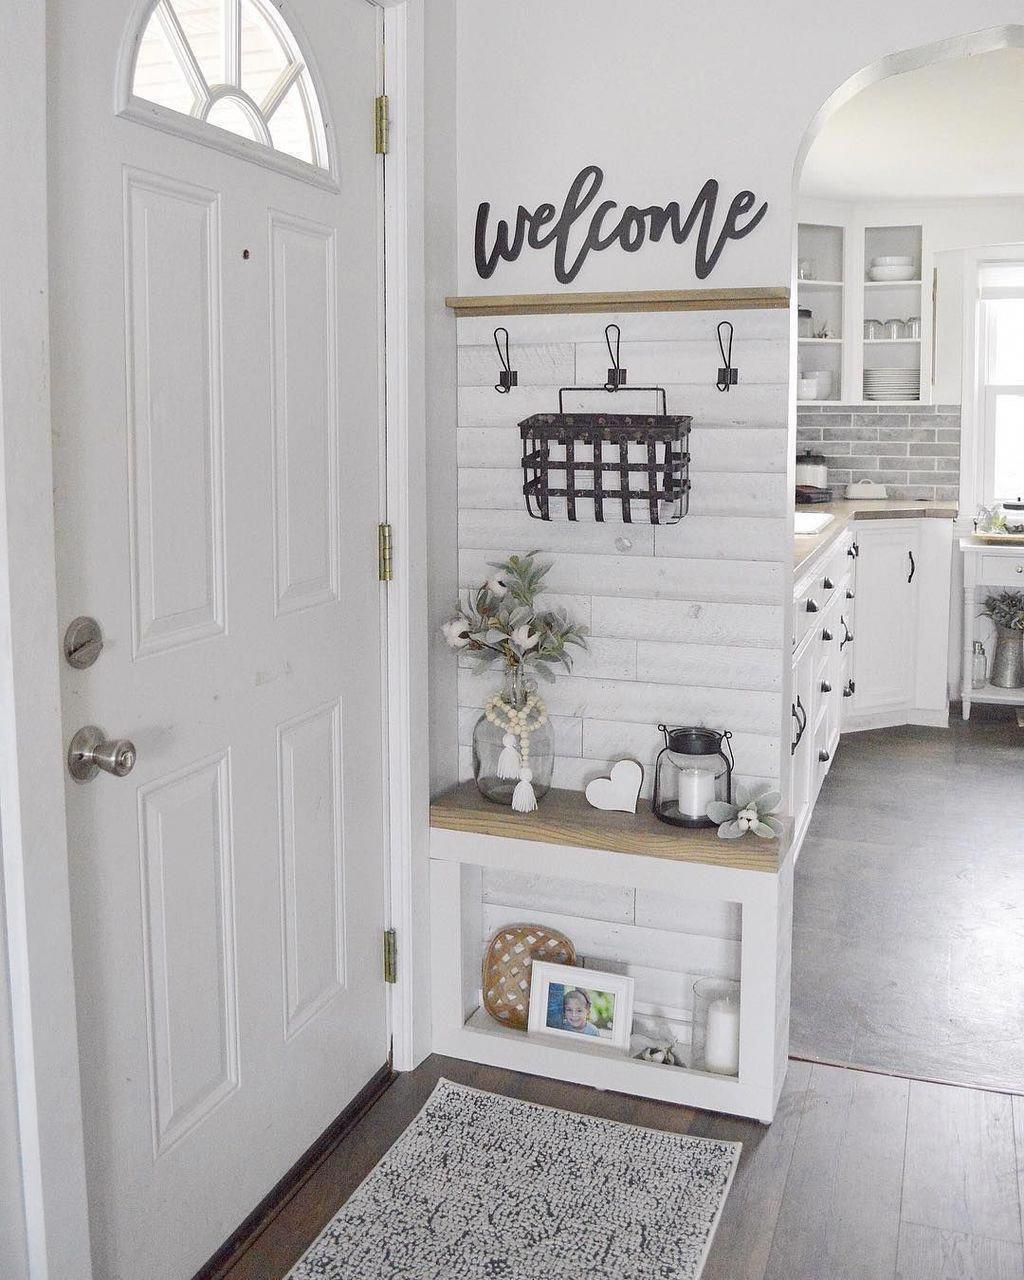 40 Stunning Farmhouse Entryway Decor Ideas Entrywaydecor Entryway Decor Small Small Decor Home Decor